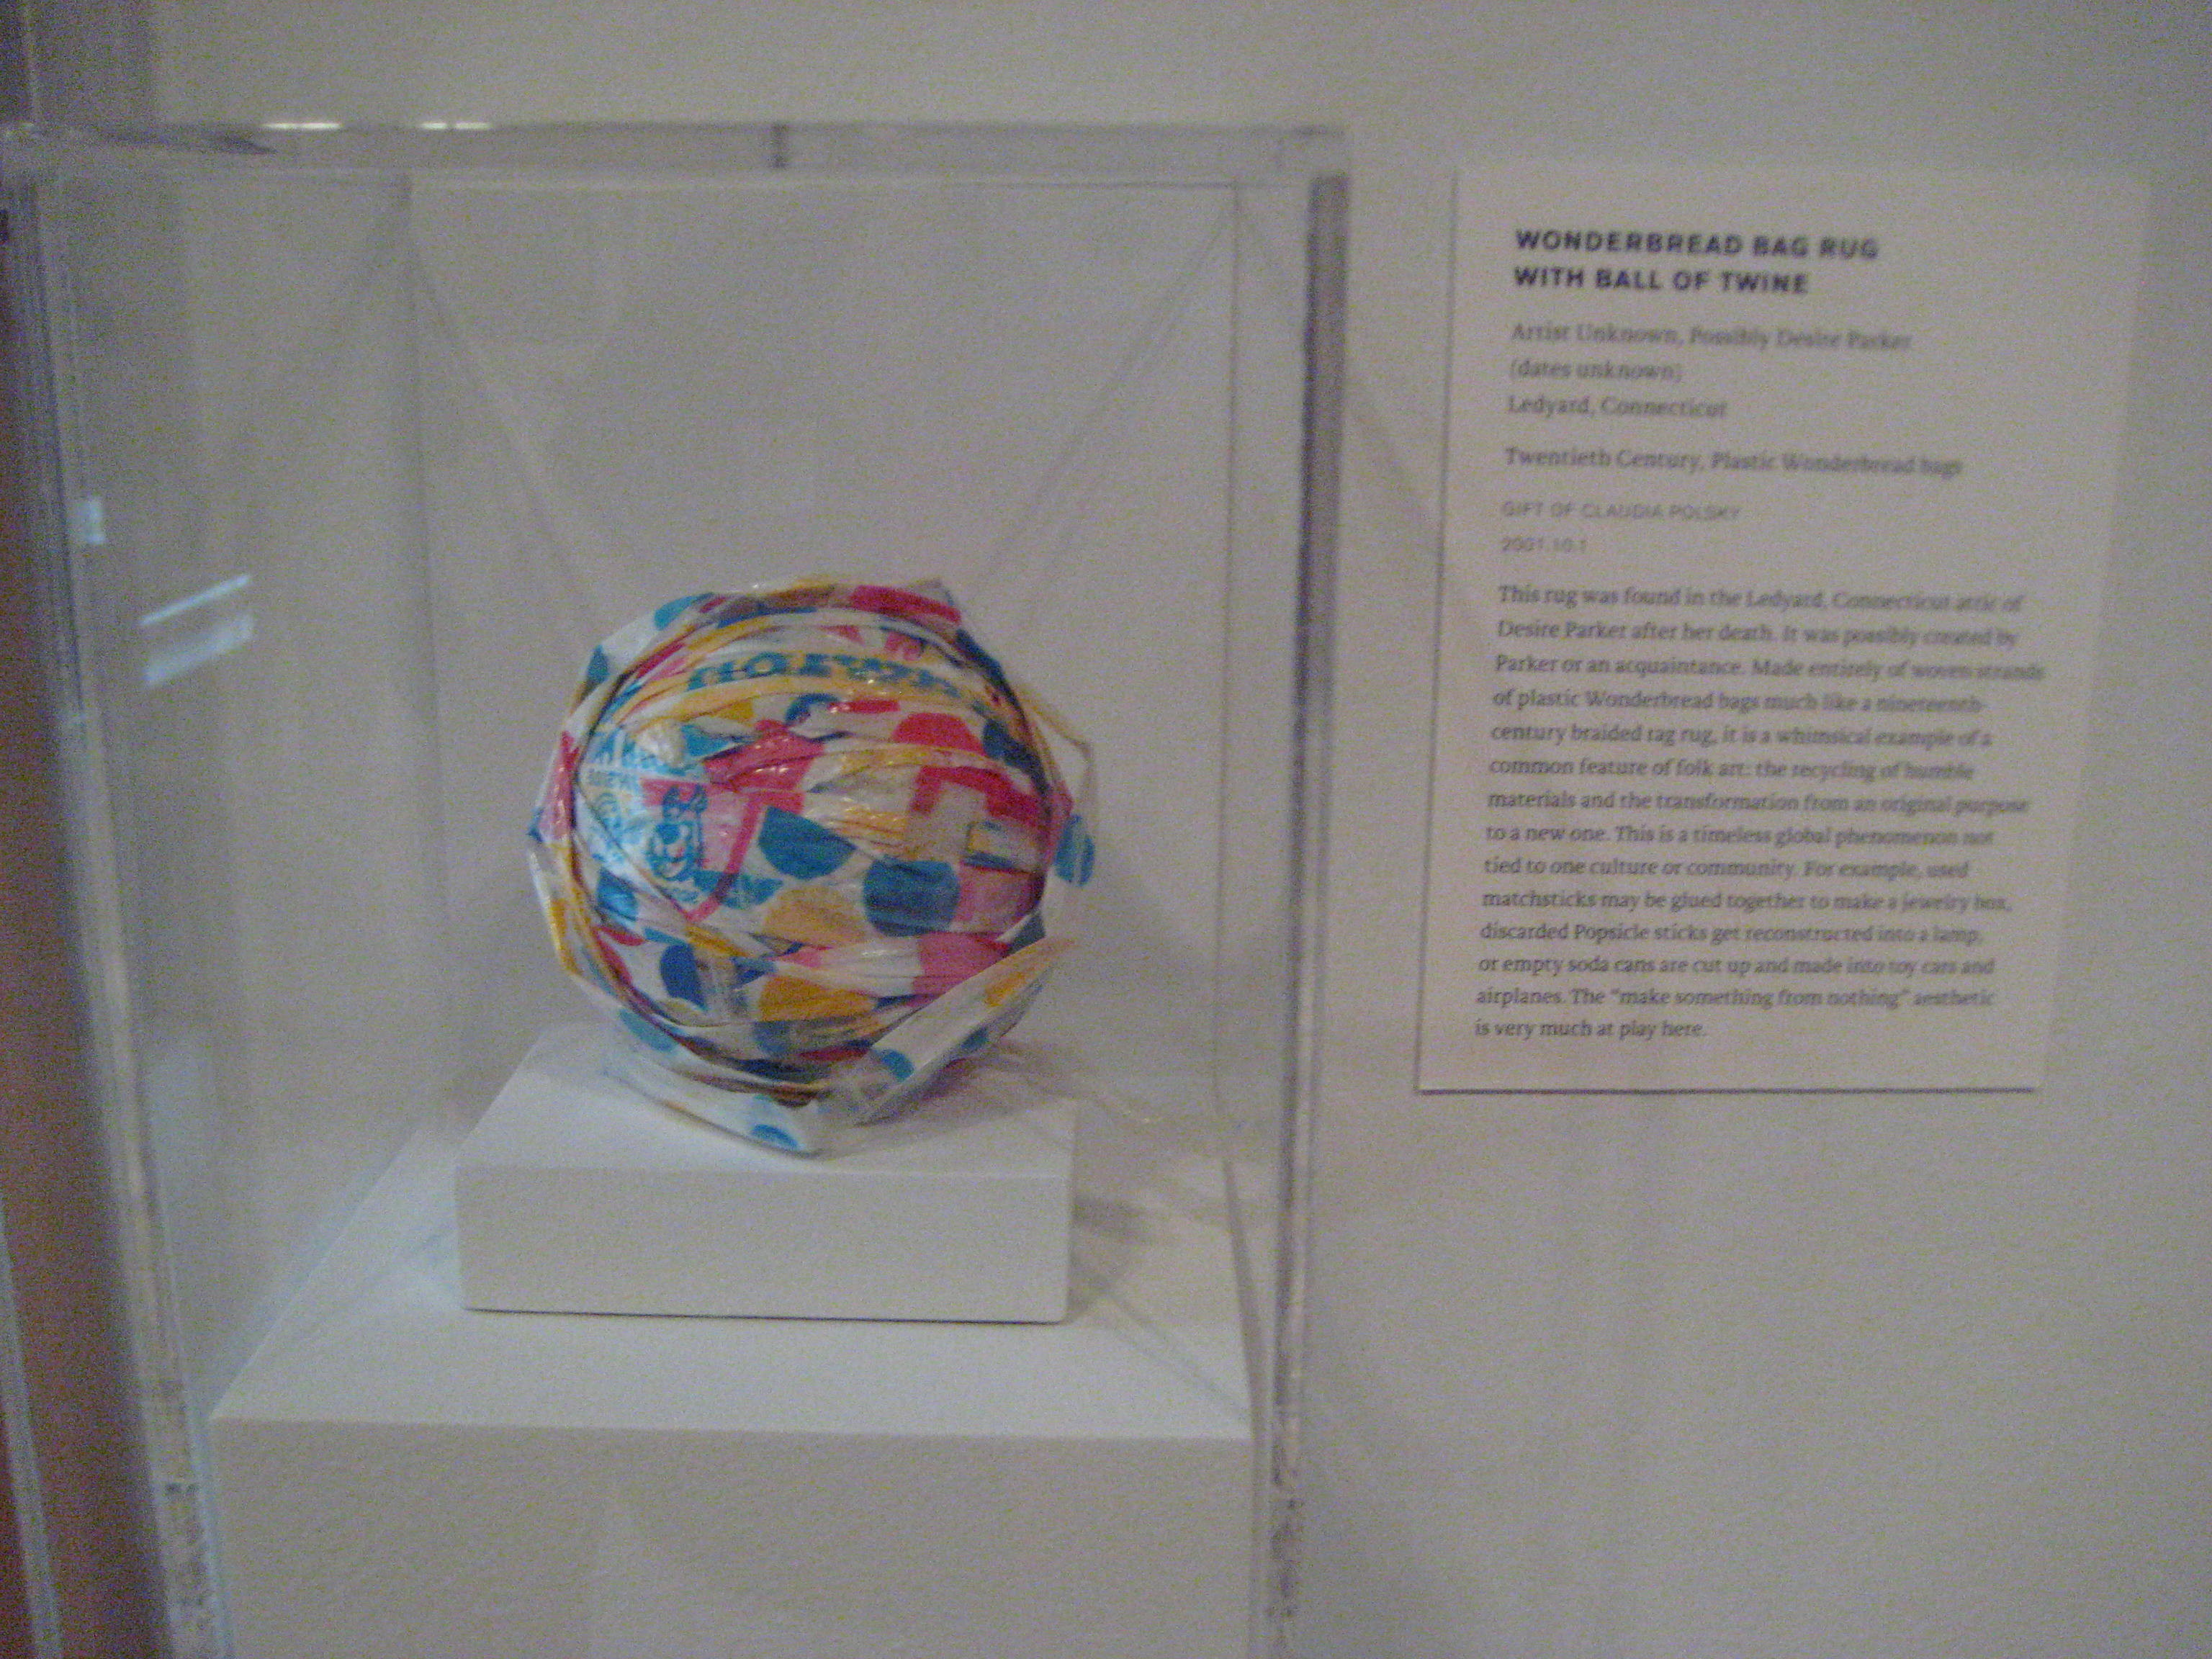 wonder-bread-ball